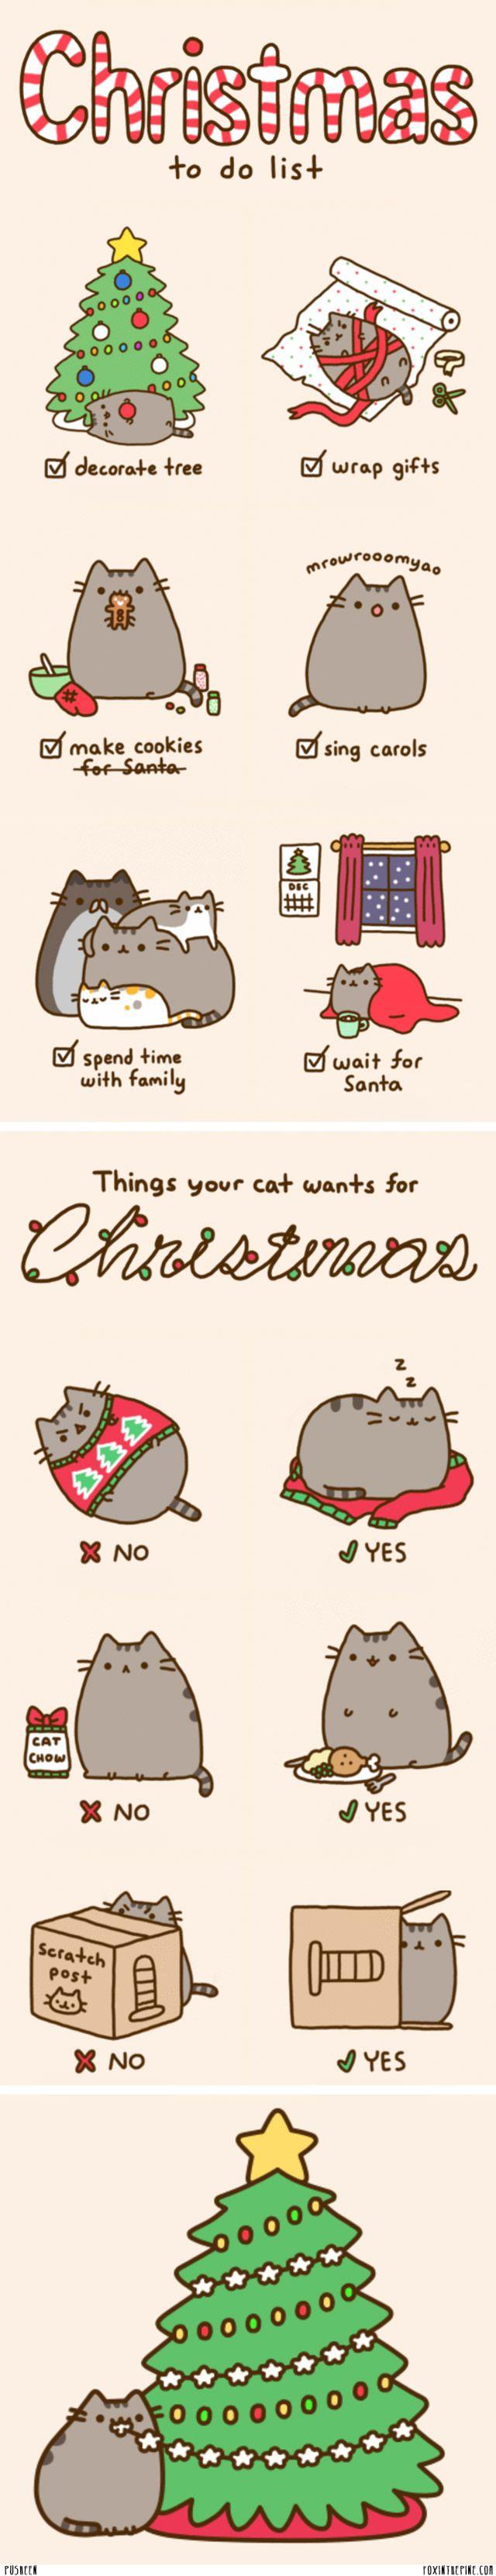 Pusheen the cat - Christmas special   //   FOXINTHEPINE.COM